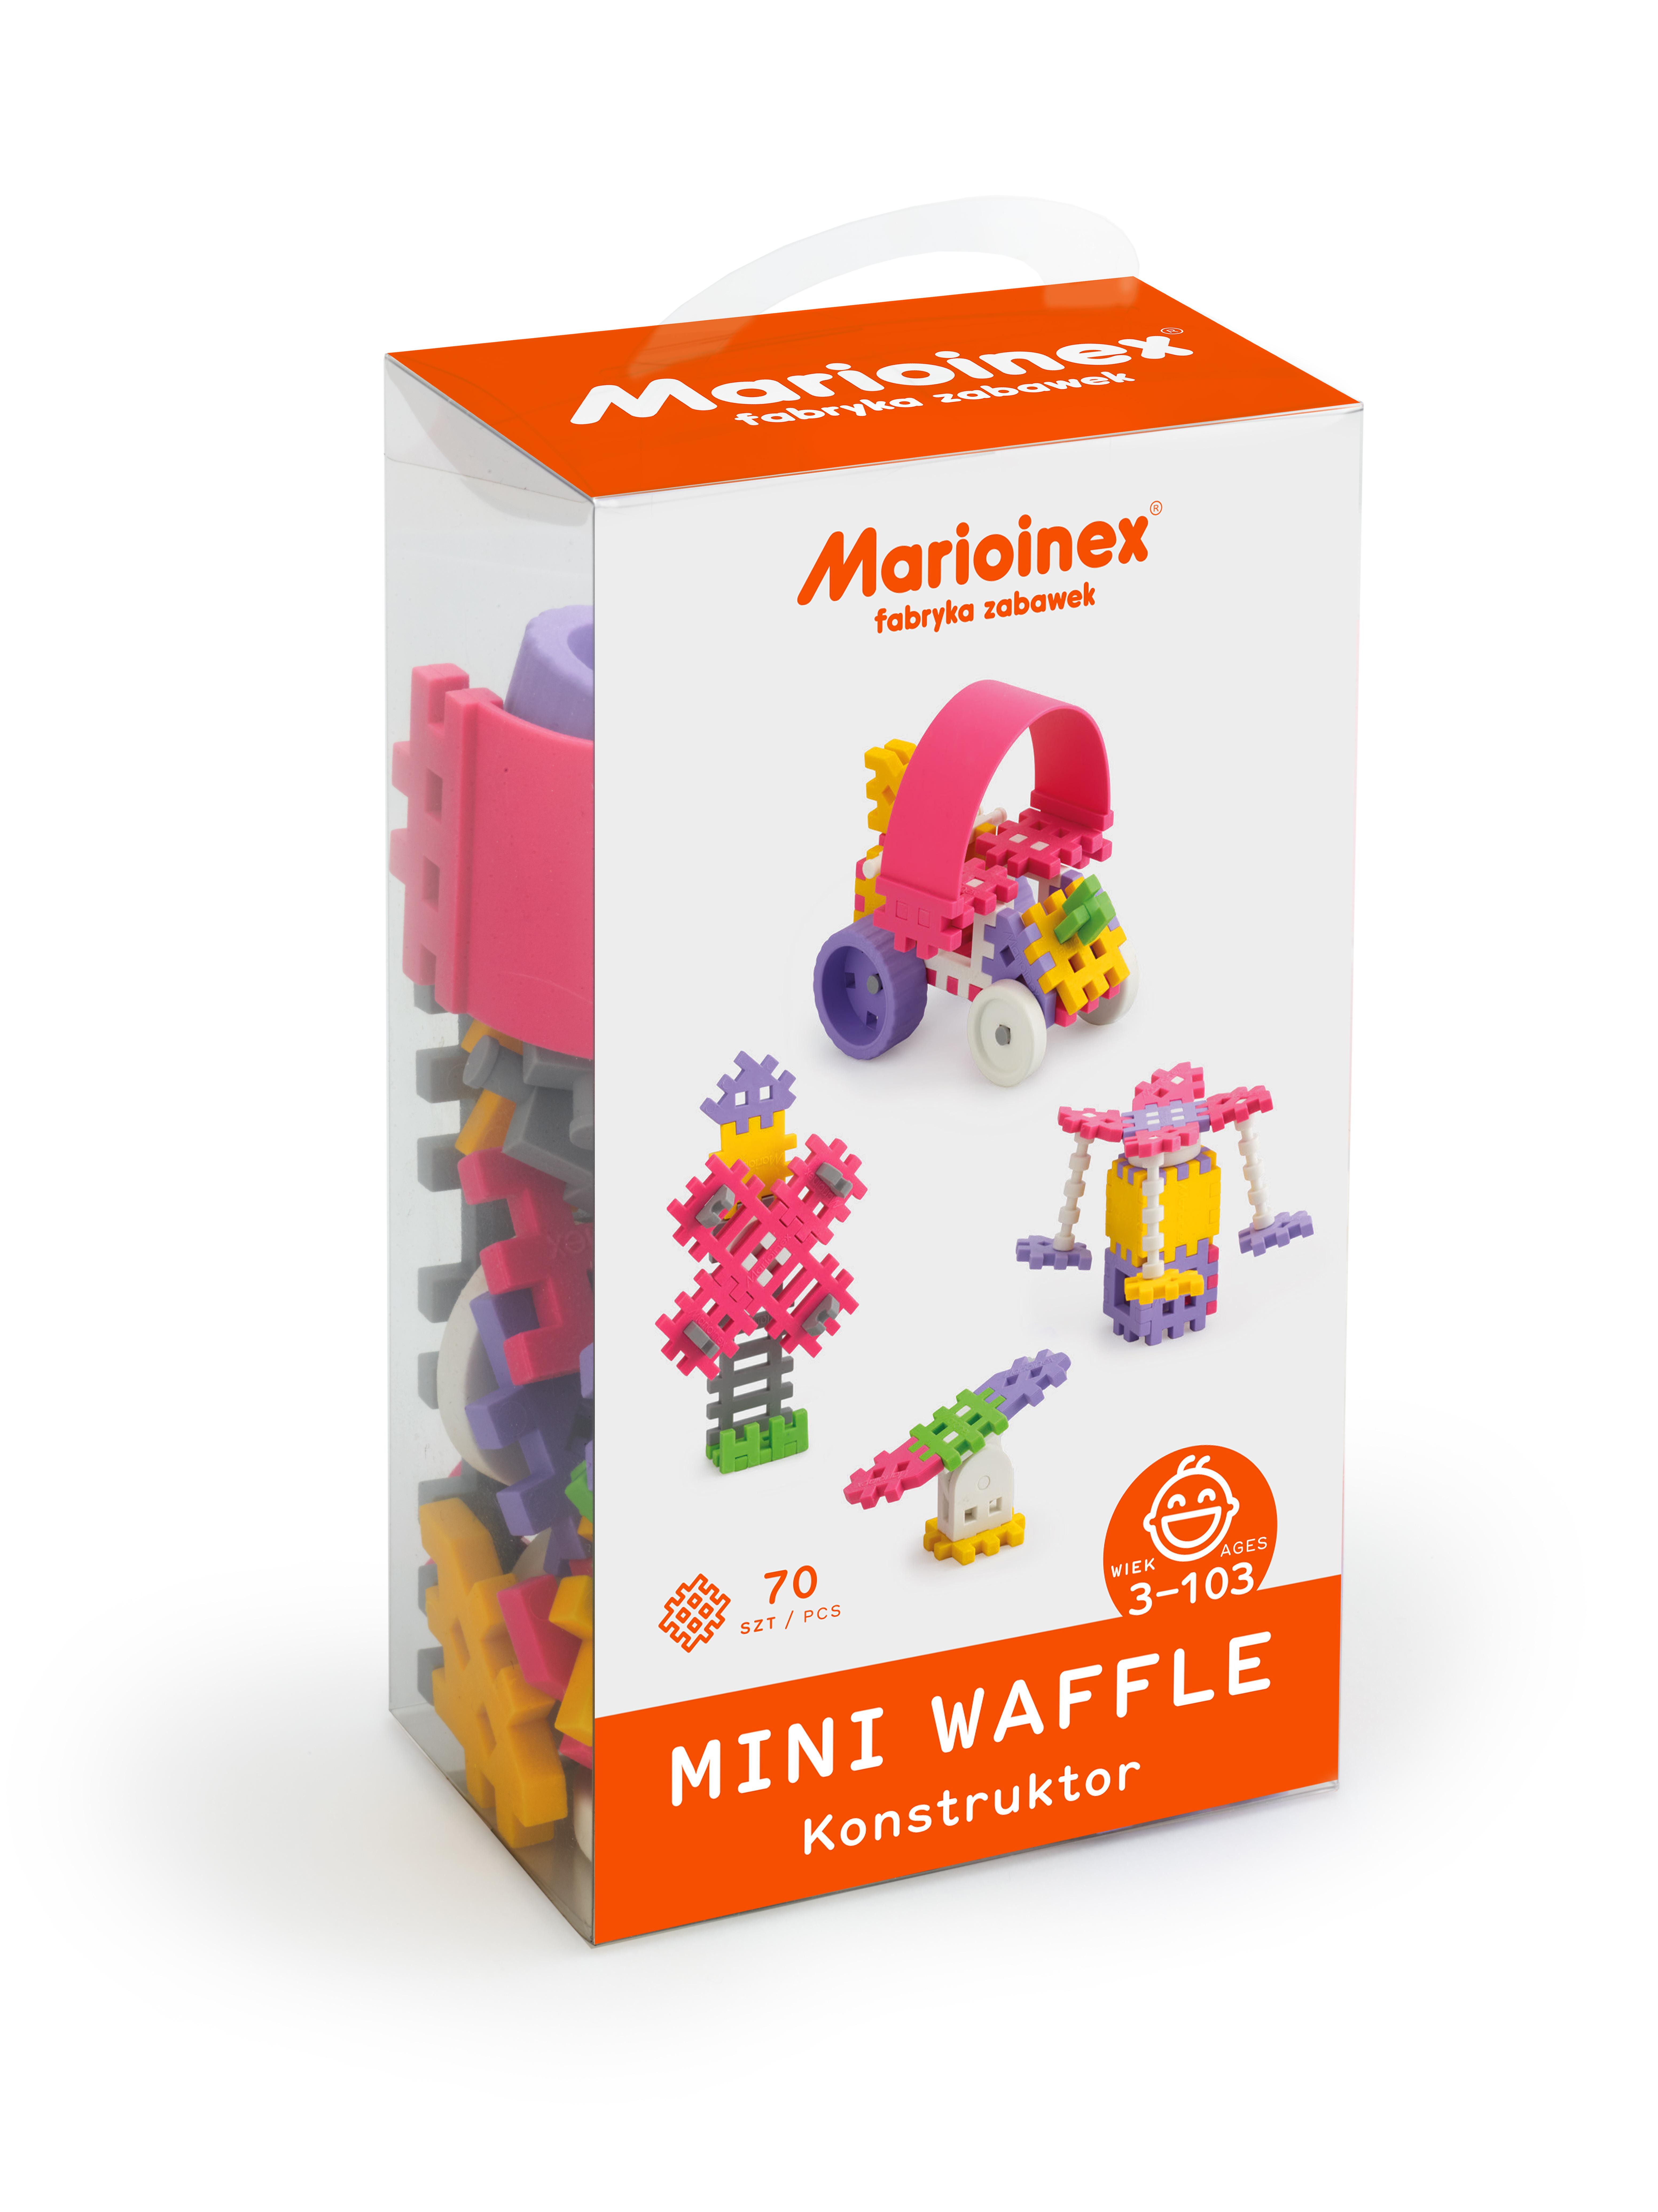 Marioinex MINI WAFLE – 70 ks Konstruktér (dívky)